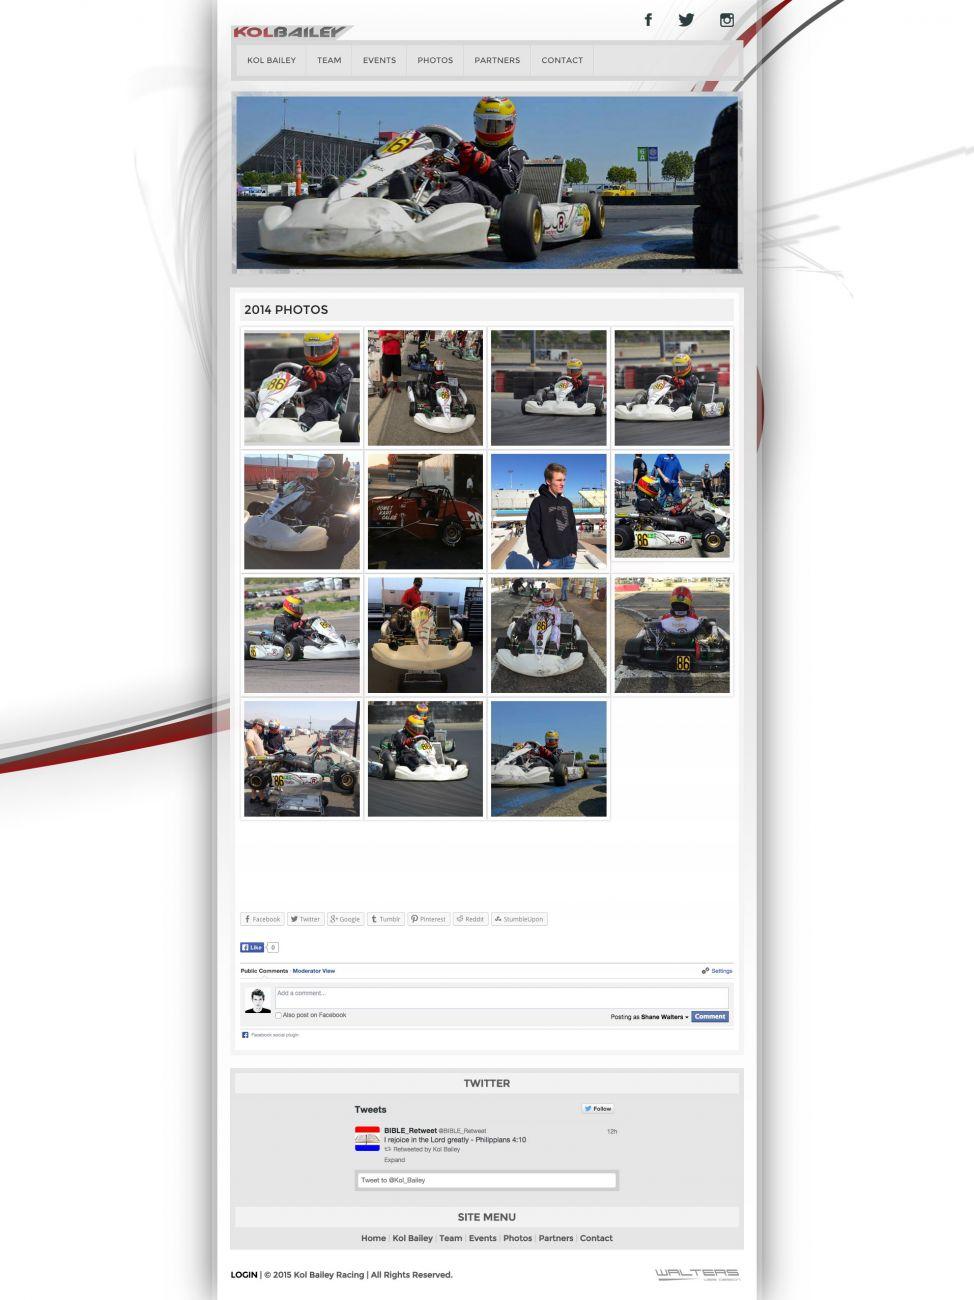 Kol Bailey SKUSA Driver Kart Racing Website - Walters Web Design